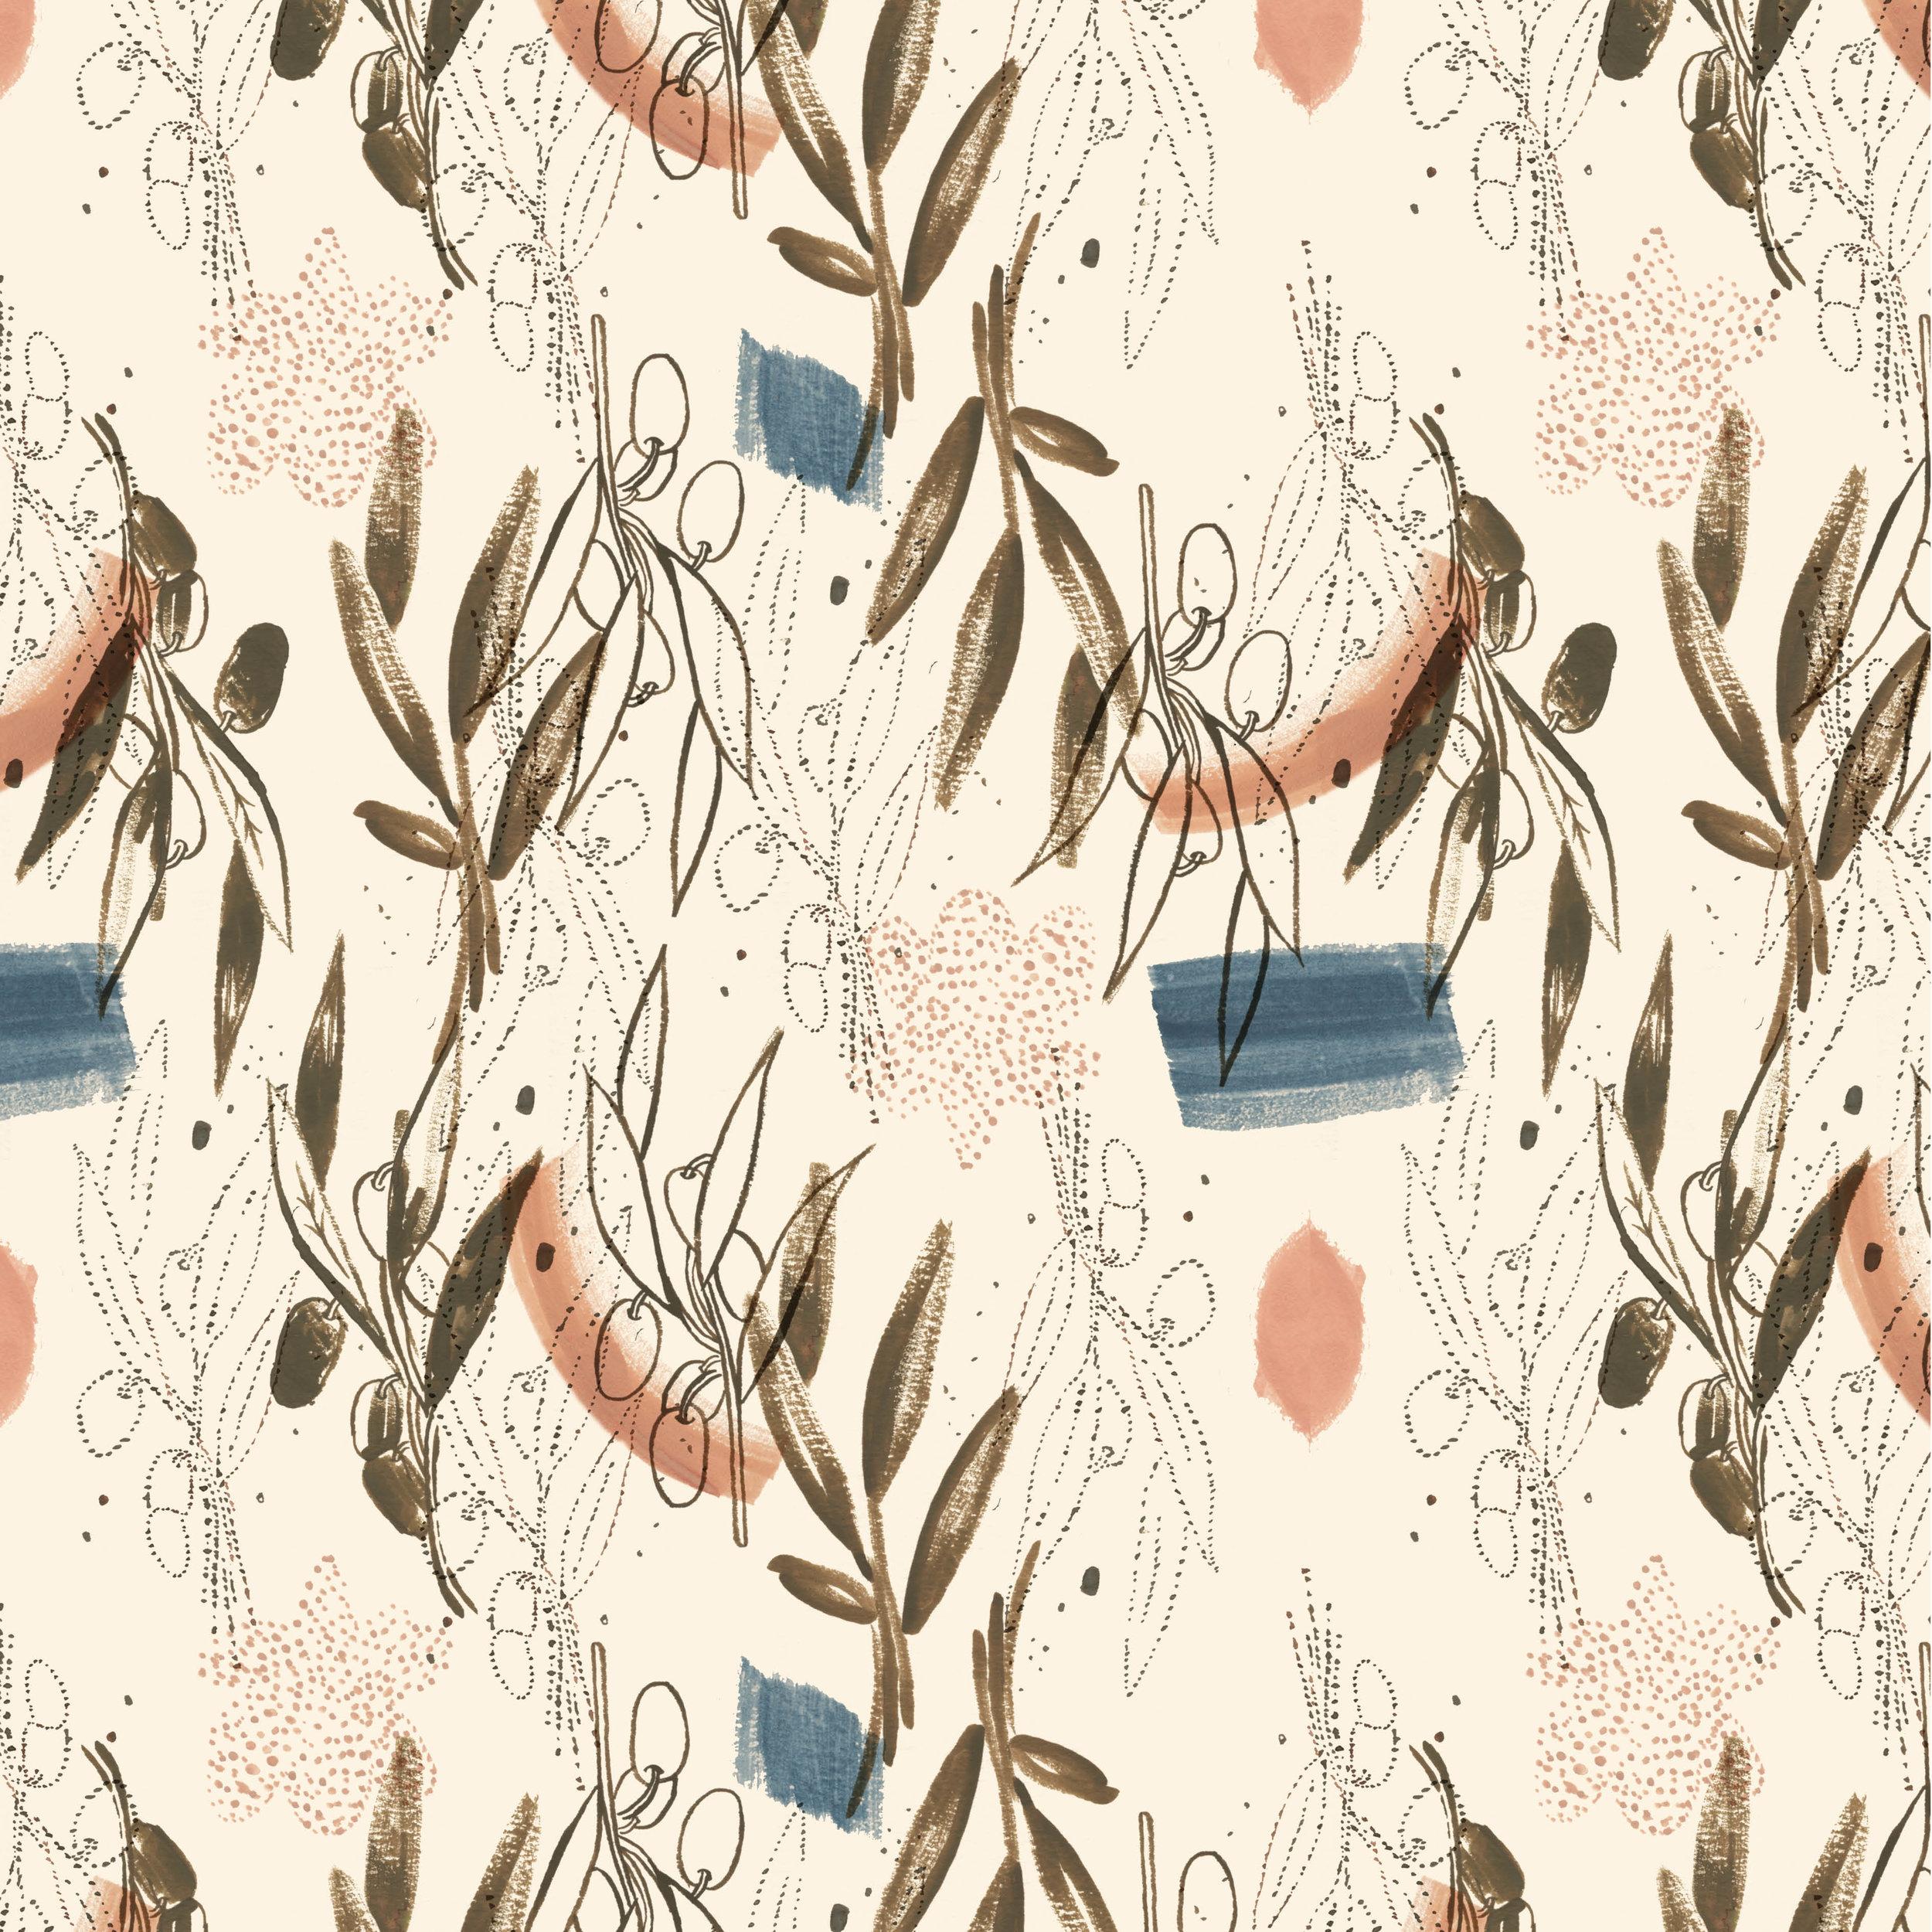 Textilefolio_banh14.jpg